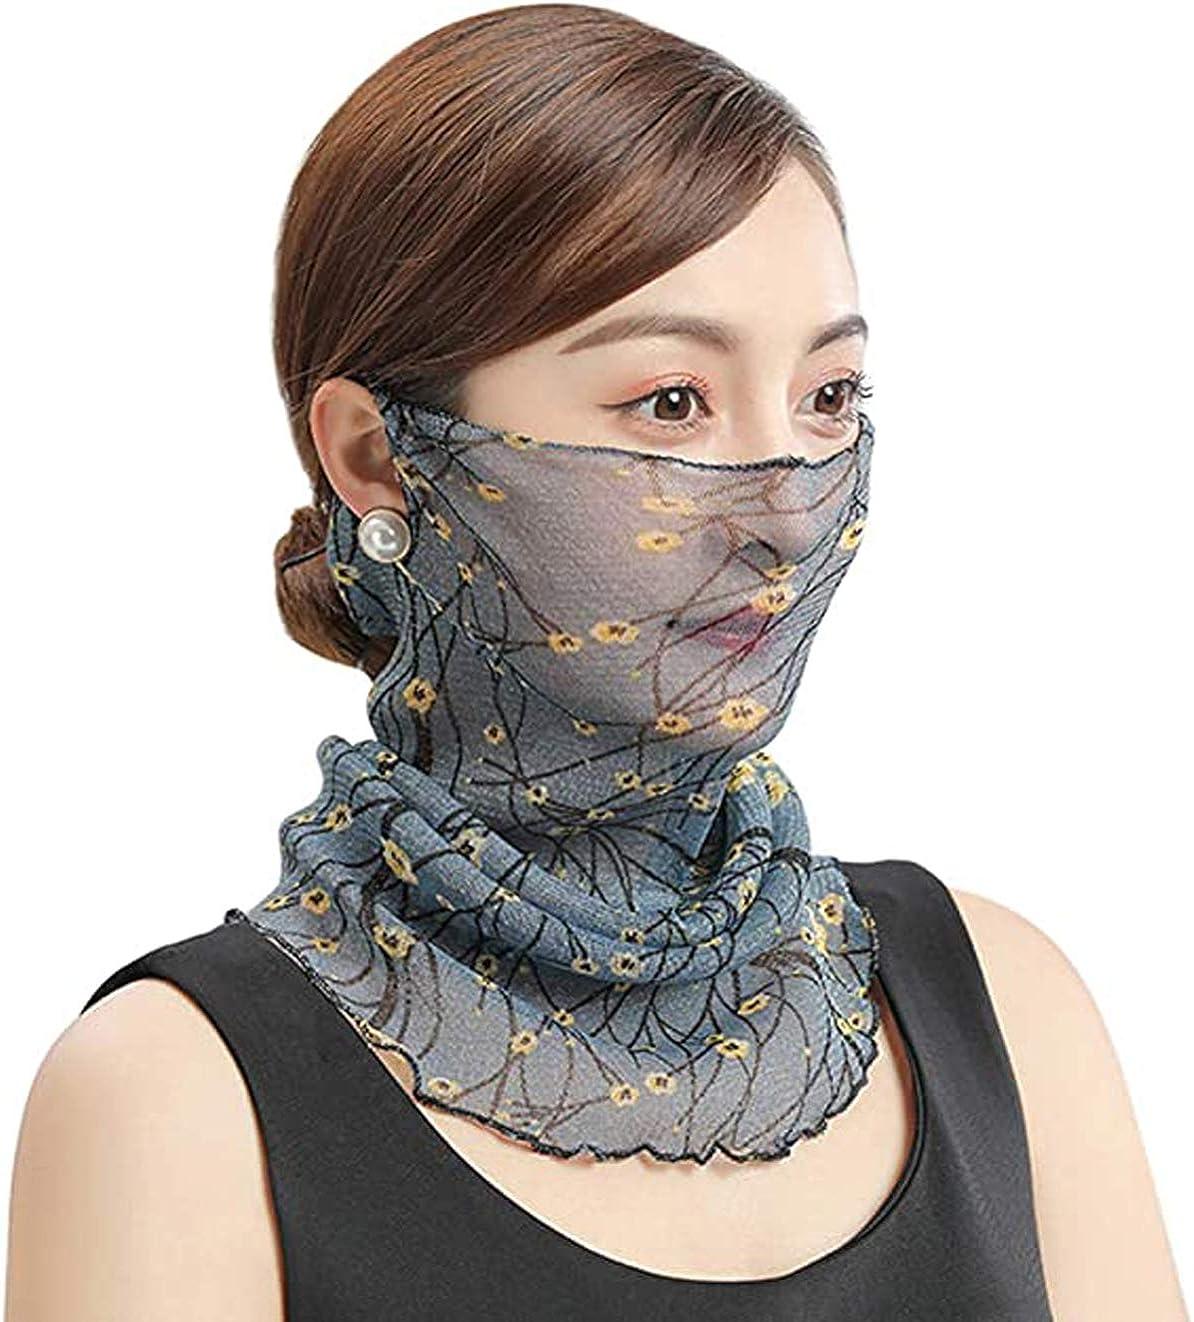 MonicaSun Face Scarf Mask-Dust Outdoors Balaclavas Cloth Sports Sun Protection Scarf(1pack)